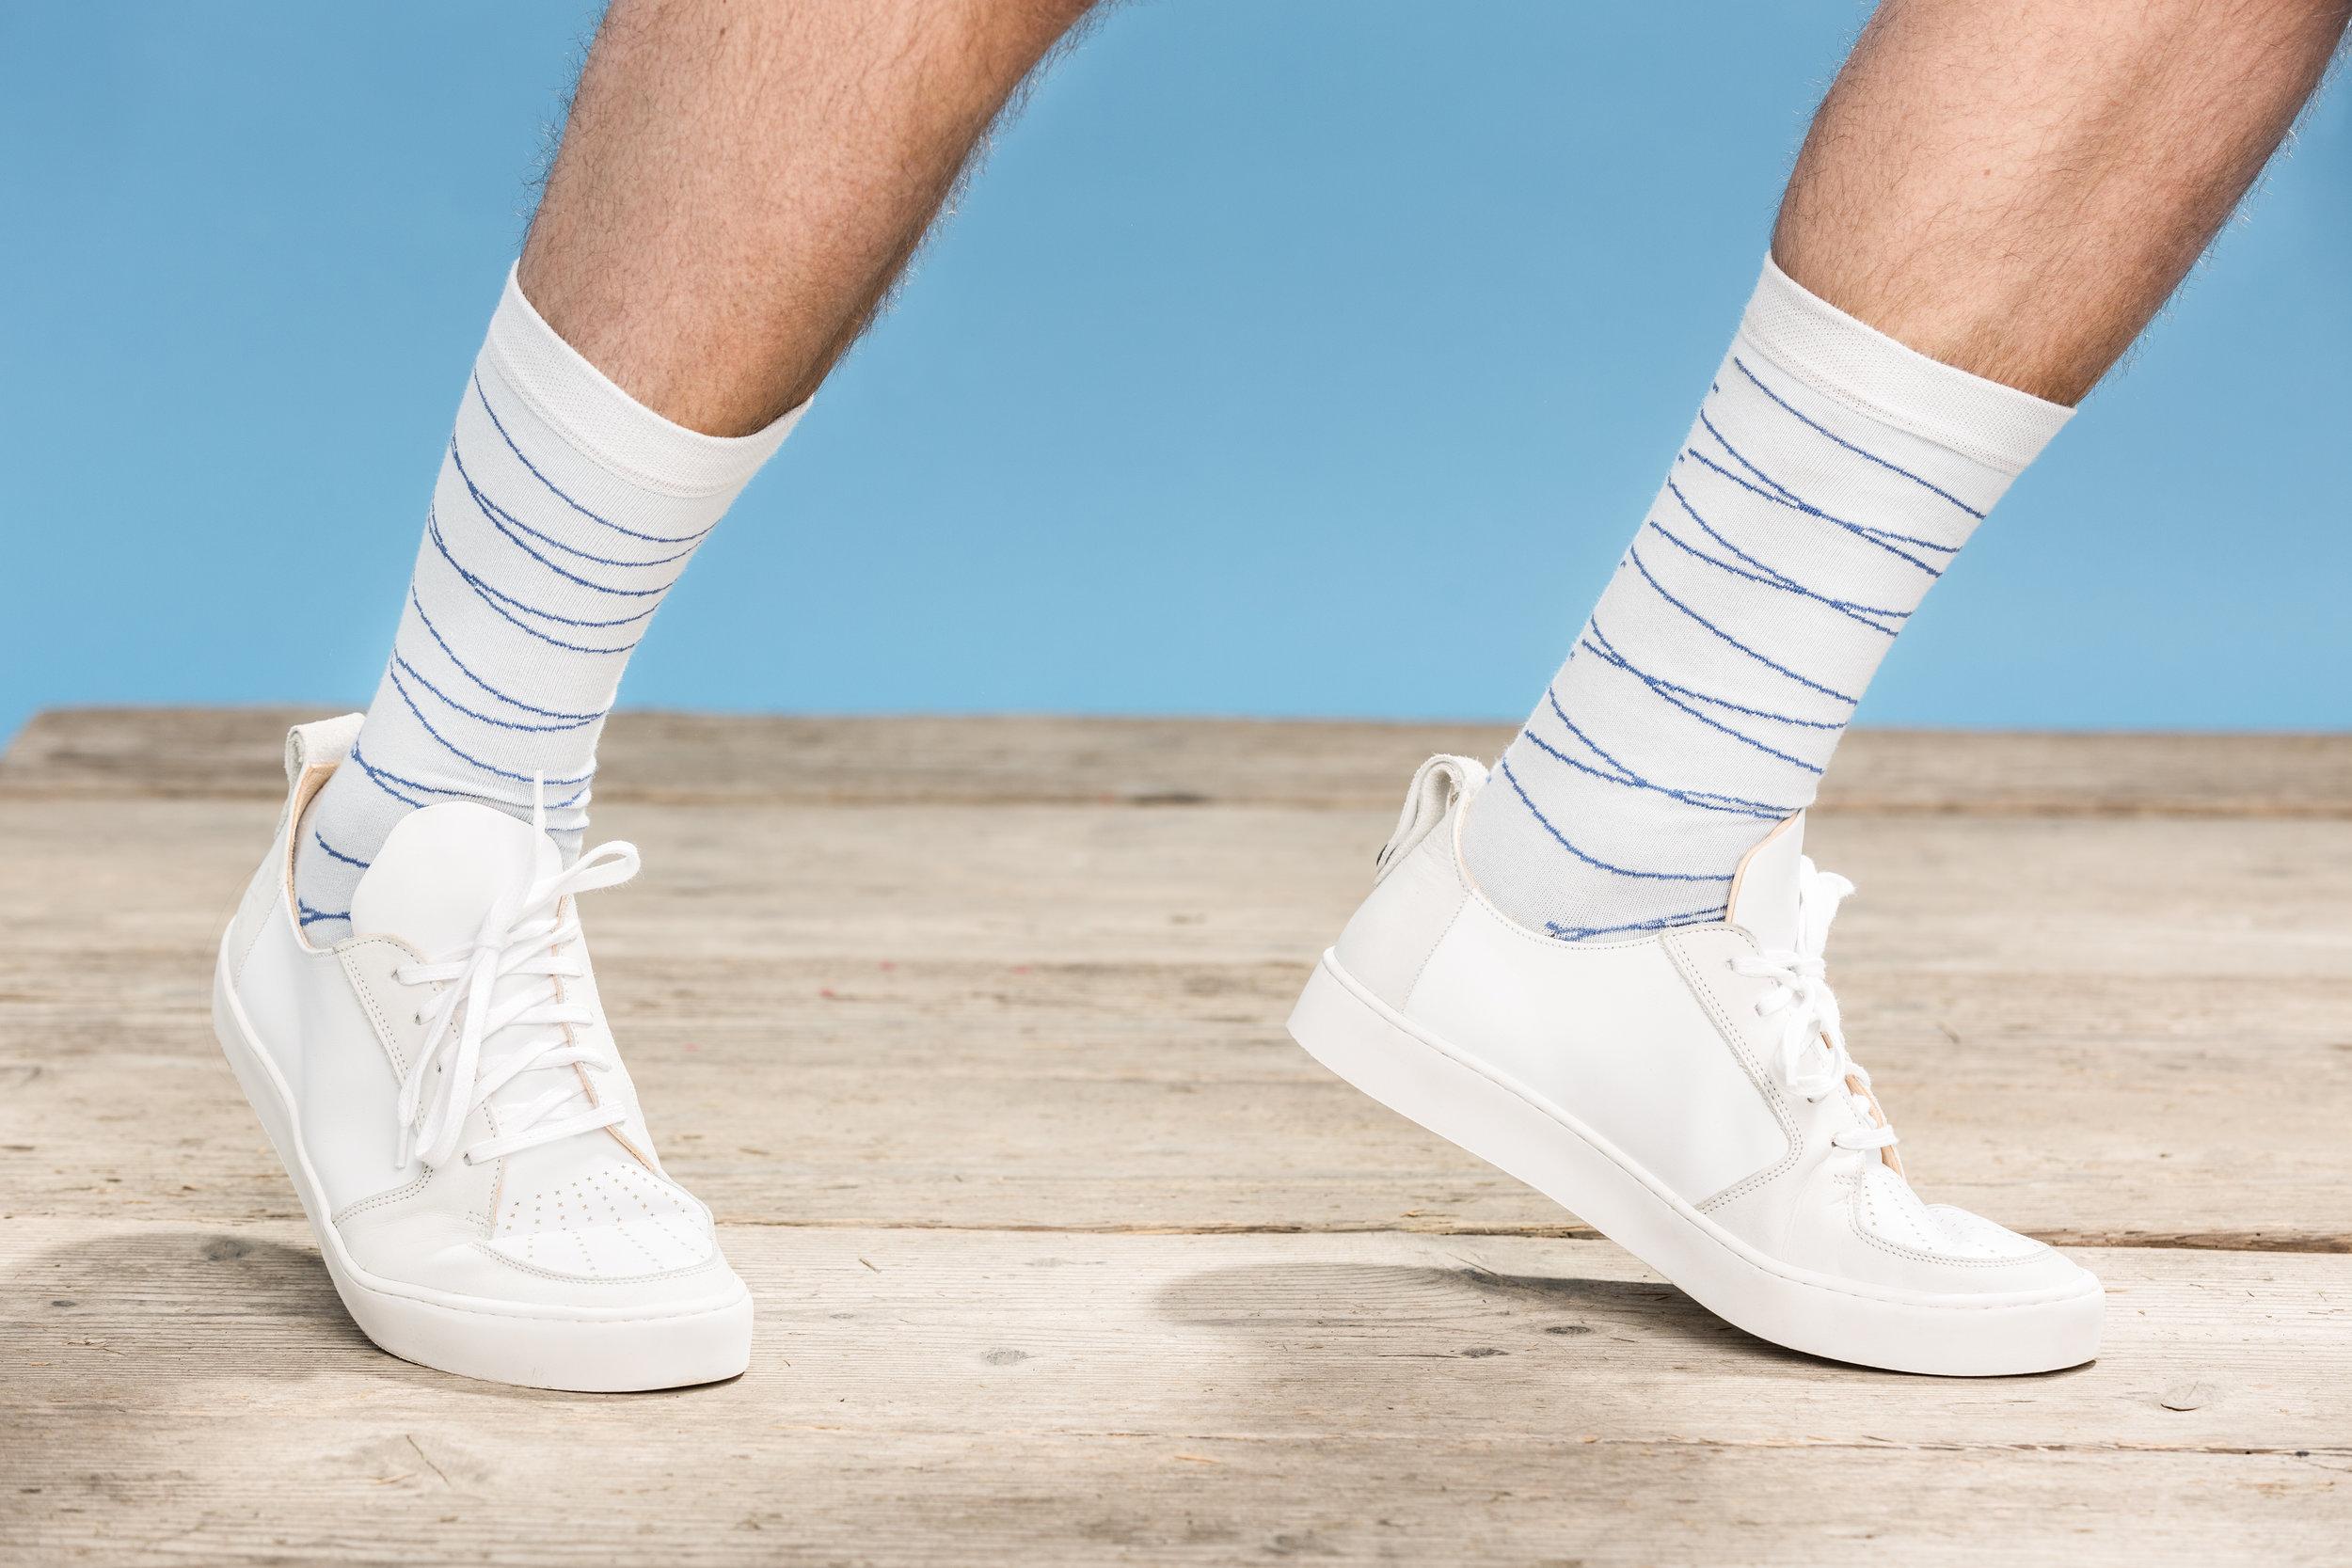 The Socks -